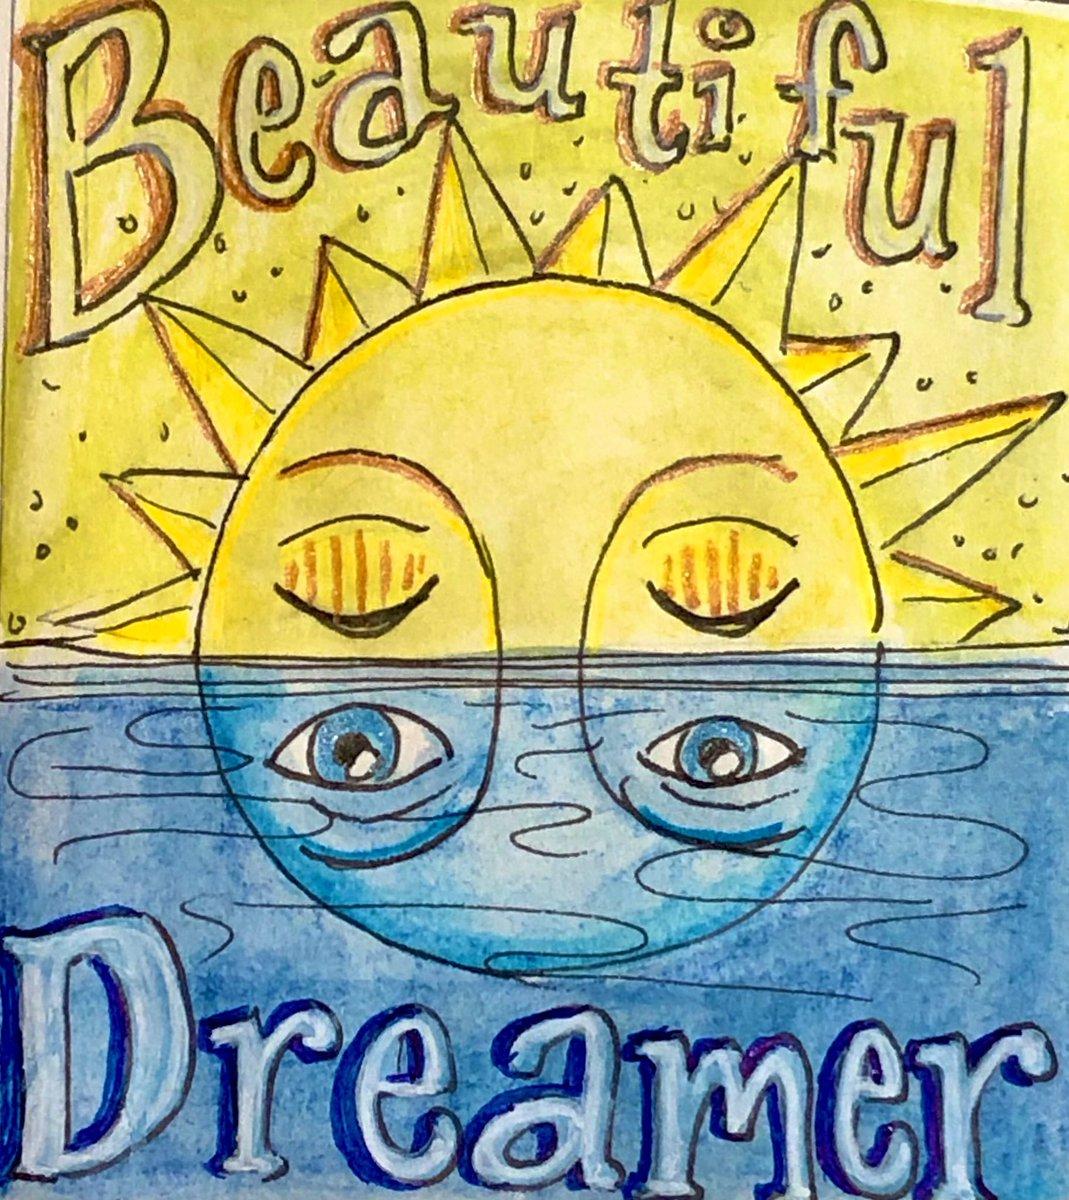 Good morning dreamers. 🌝 Happy Monday.  ✨✨✨ #MondayMood #draweveryday